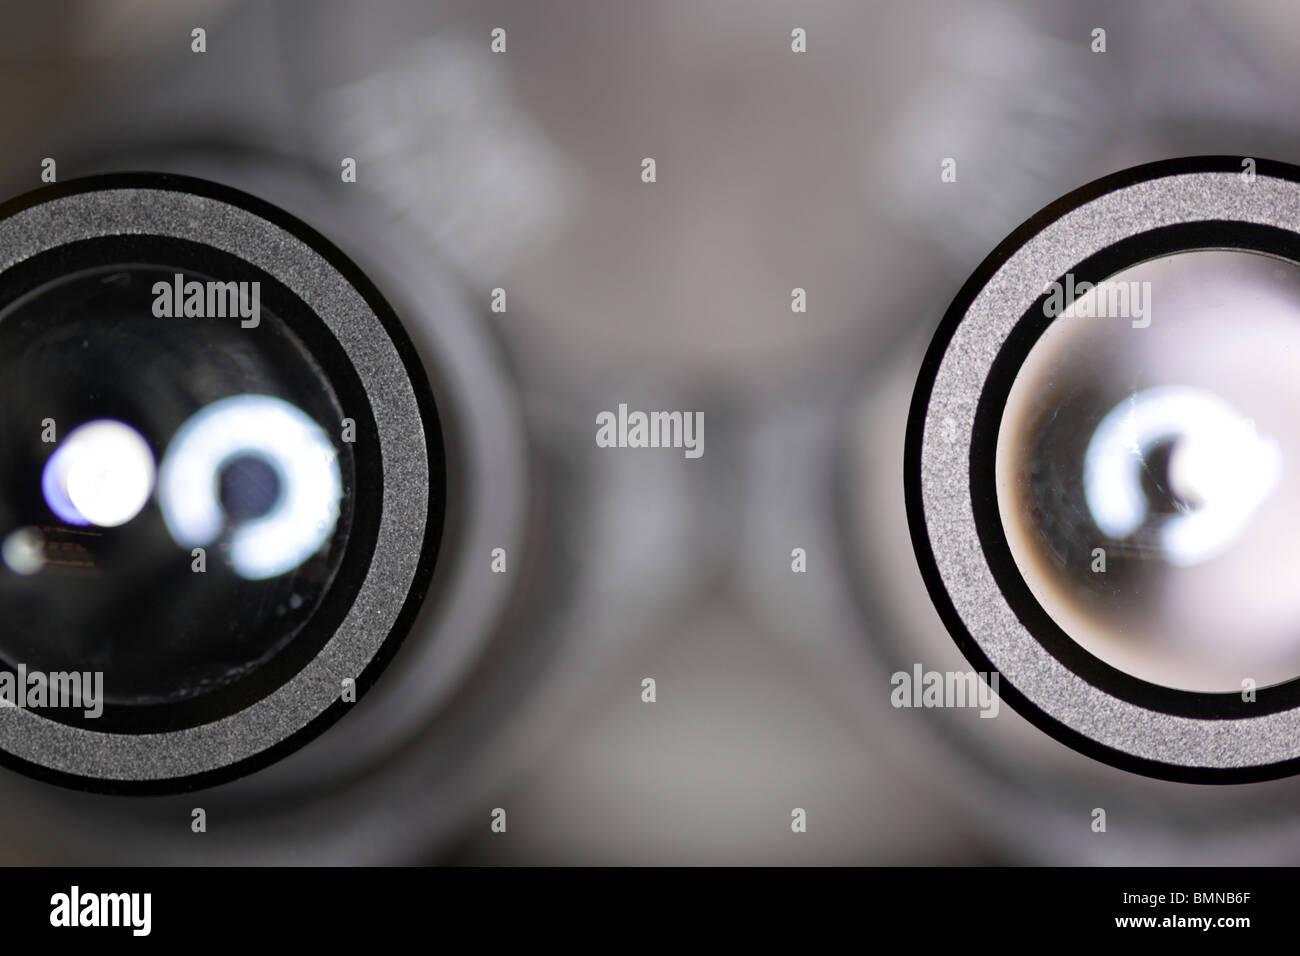 binocular microscope close up of eye piece - Stock Image